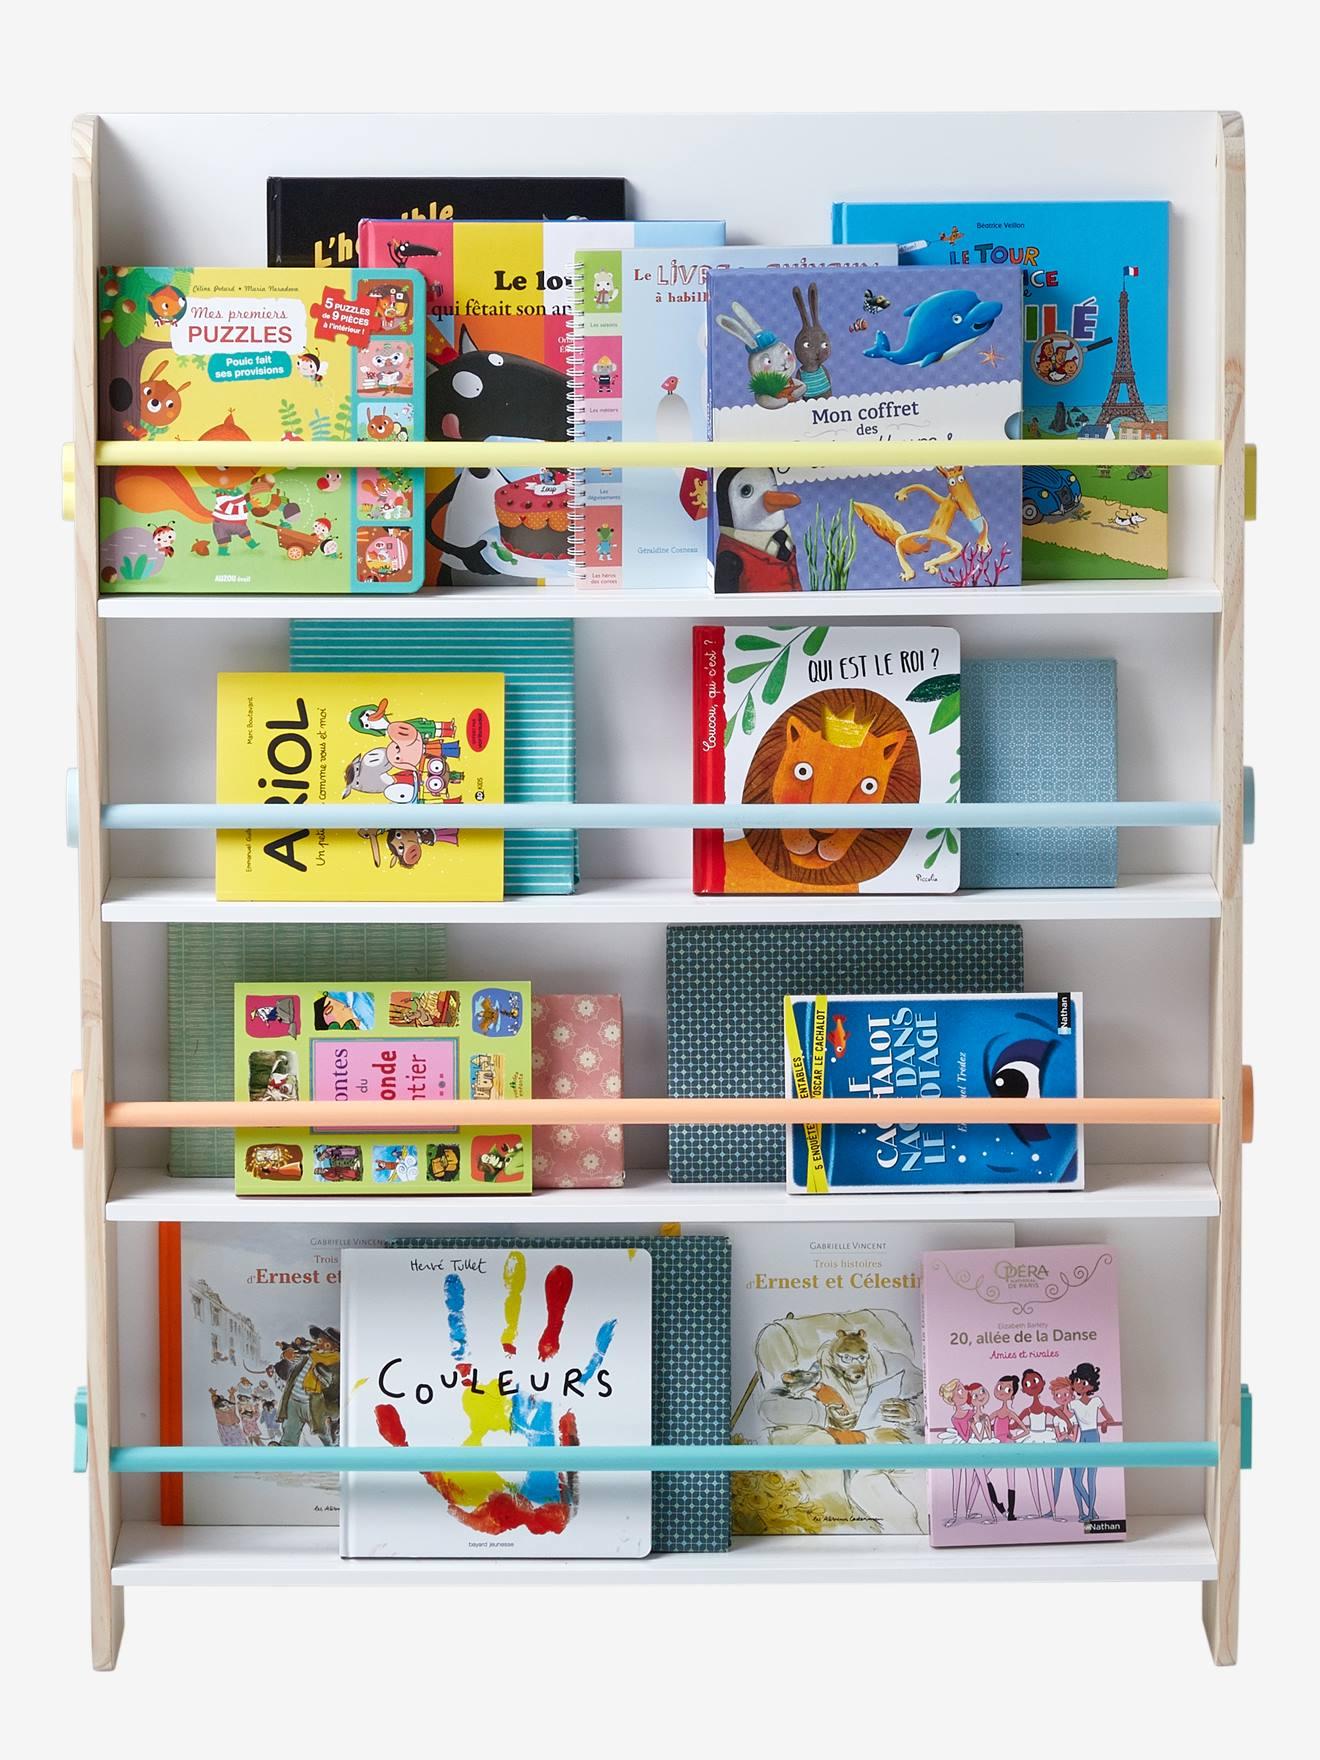 Full Size of Bücherregal Kinderzimmer Vertbaudet Bcherregal Regal Weiß Regale Sofa Kinderzimmer Bücherregal Kinderzimmer